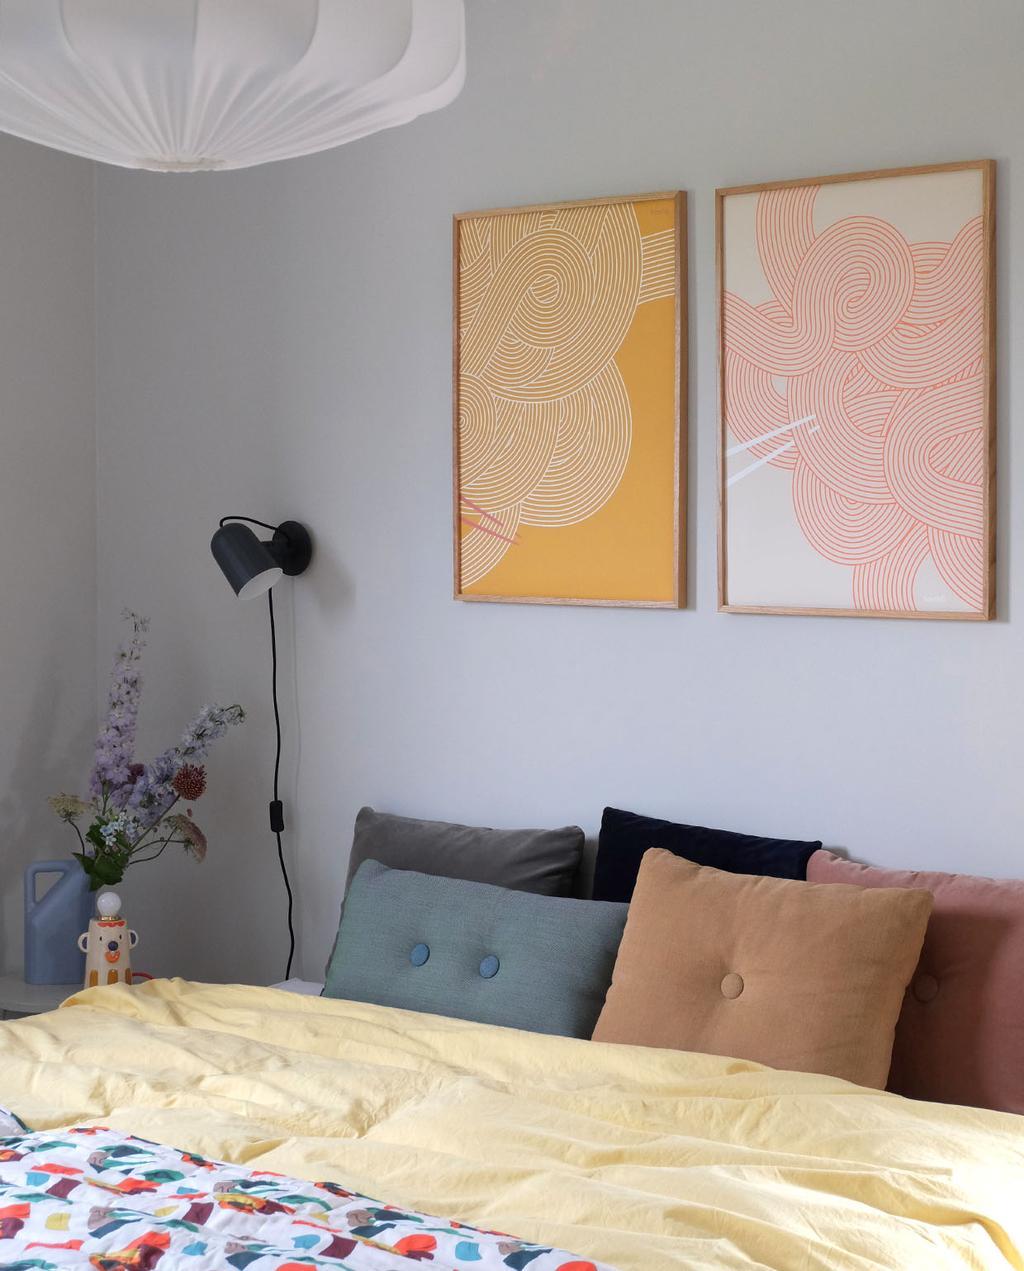 vtwonen blog prchtg | art wall oranje en rode abstracte print